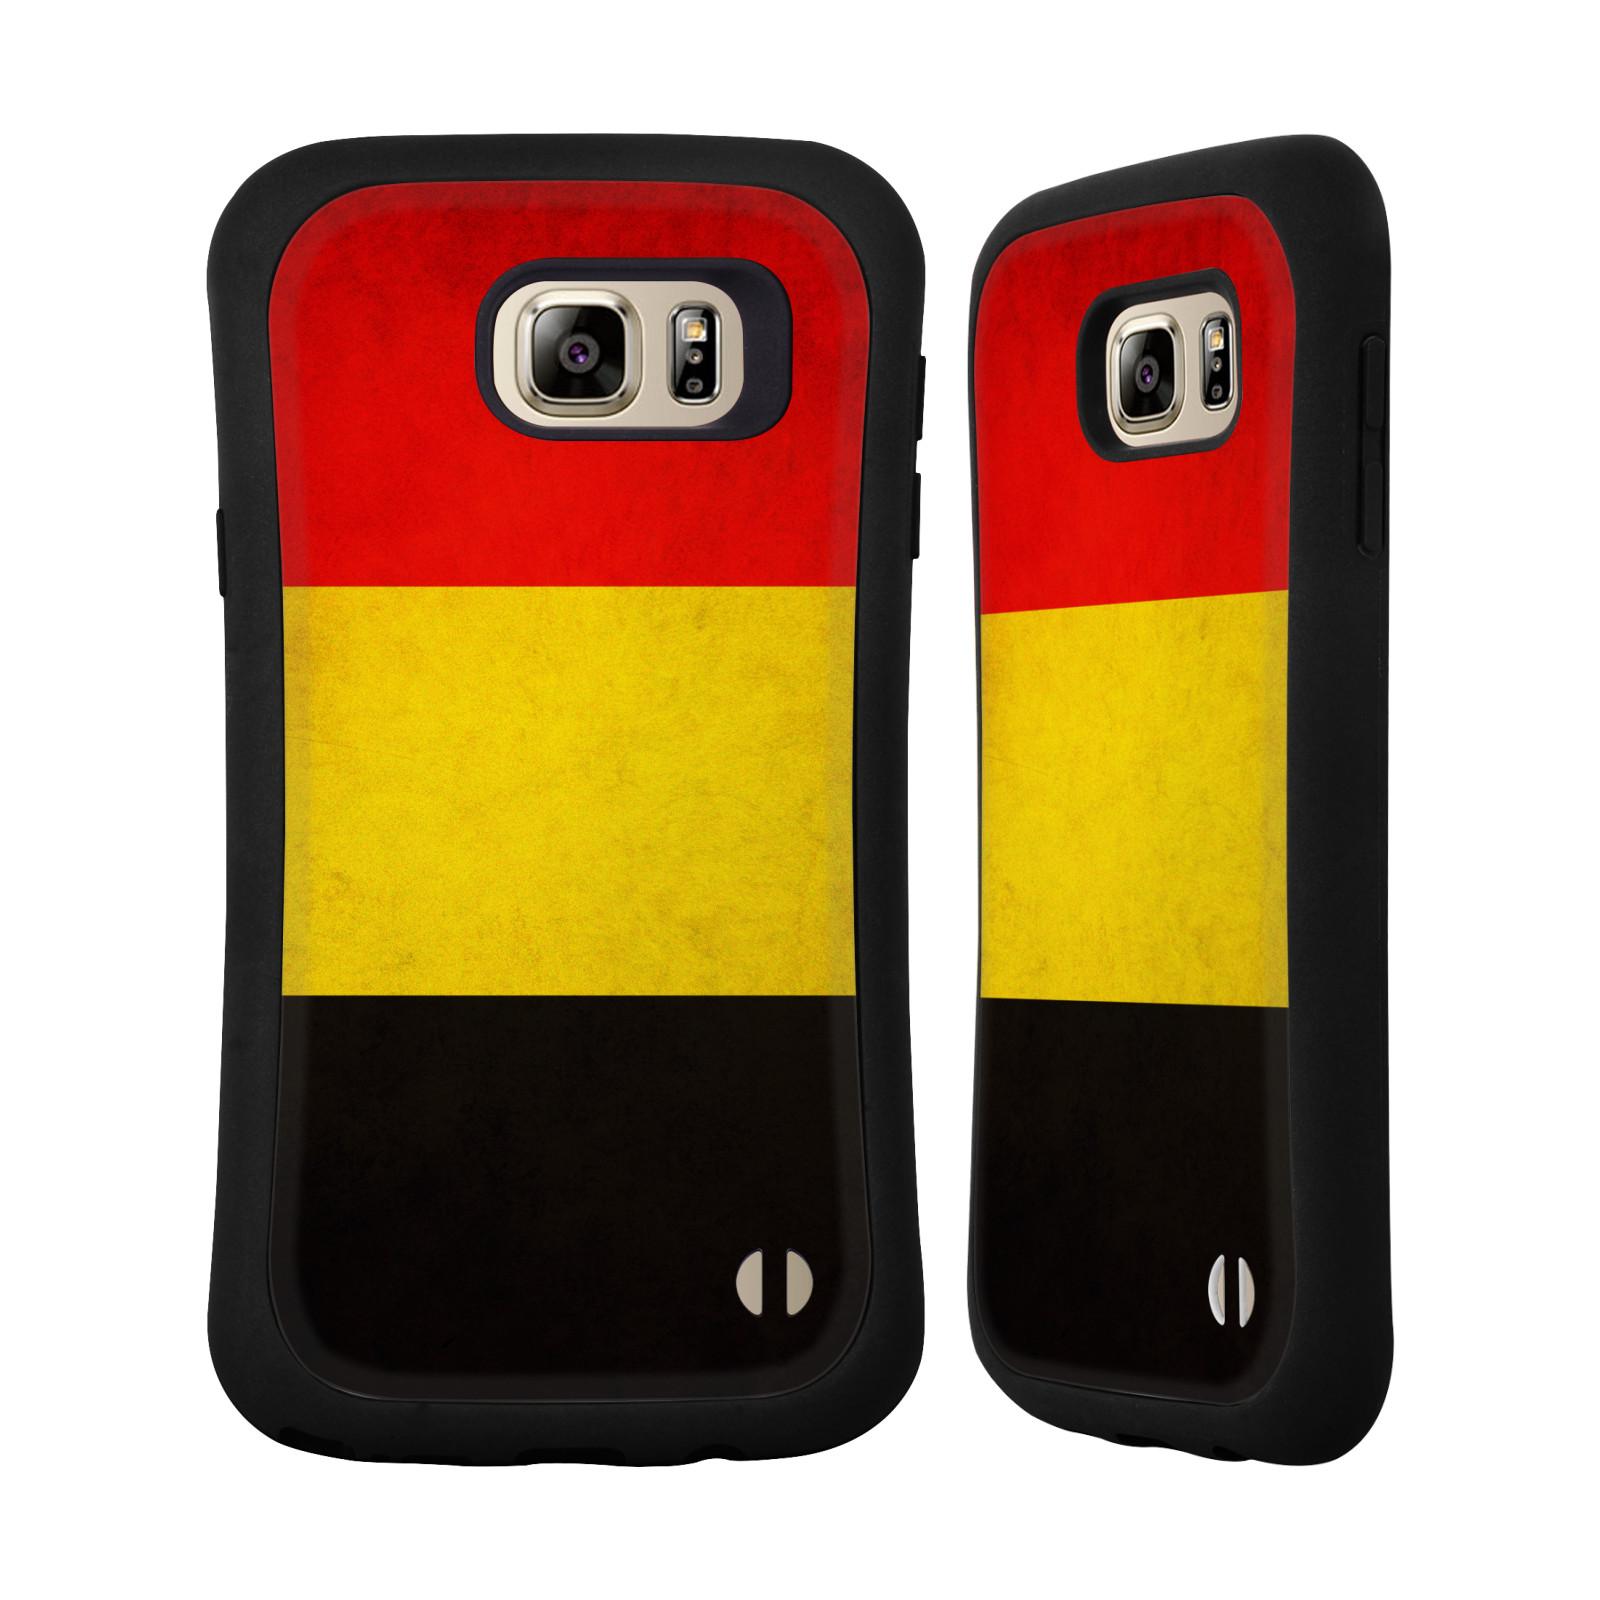 HEAD CASE DESIGNS VINTAGE FLAGS HYBRID CASE FOR SAMSUNG PHONES